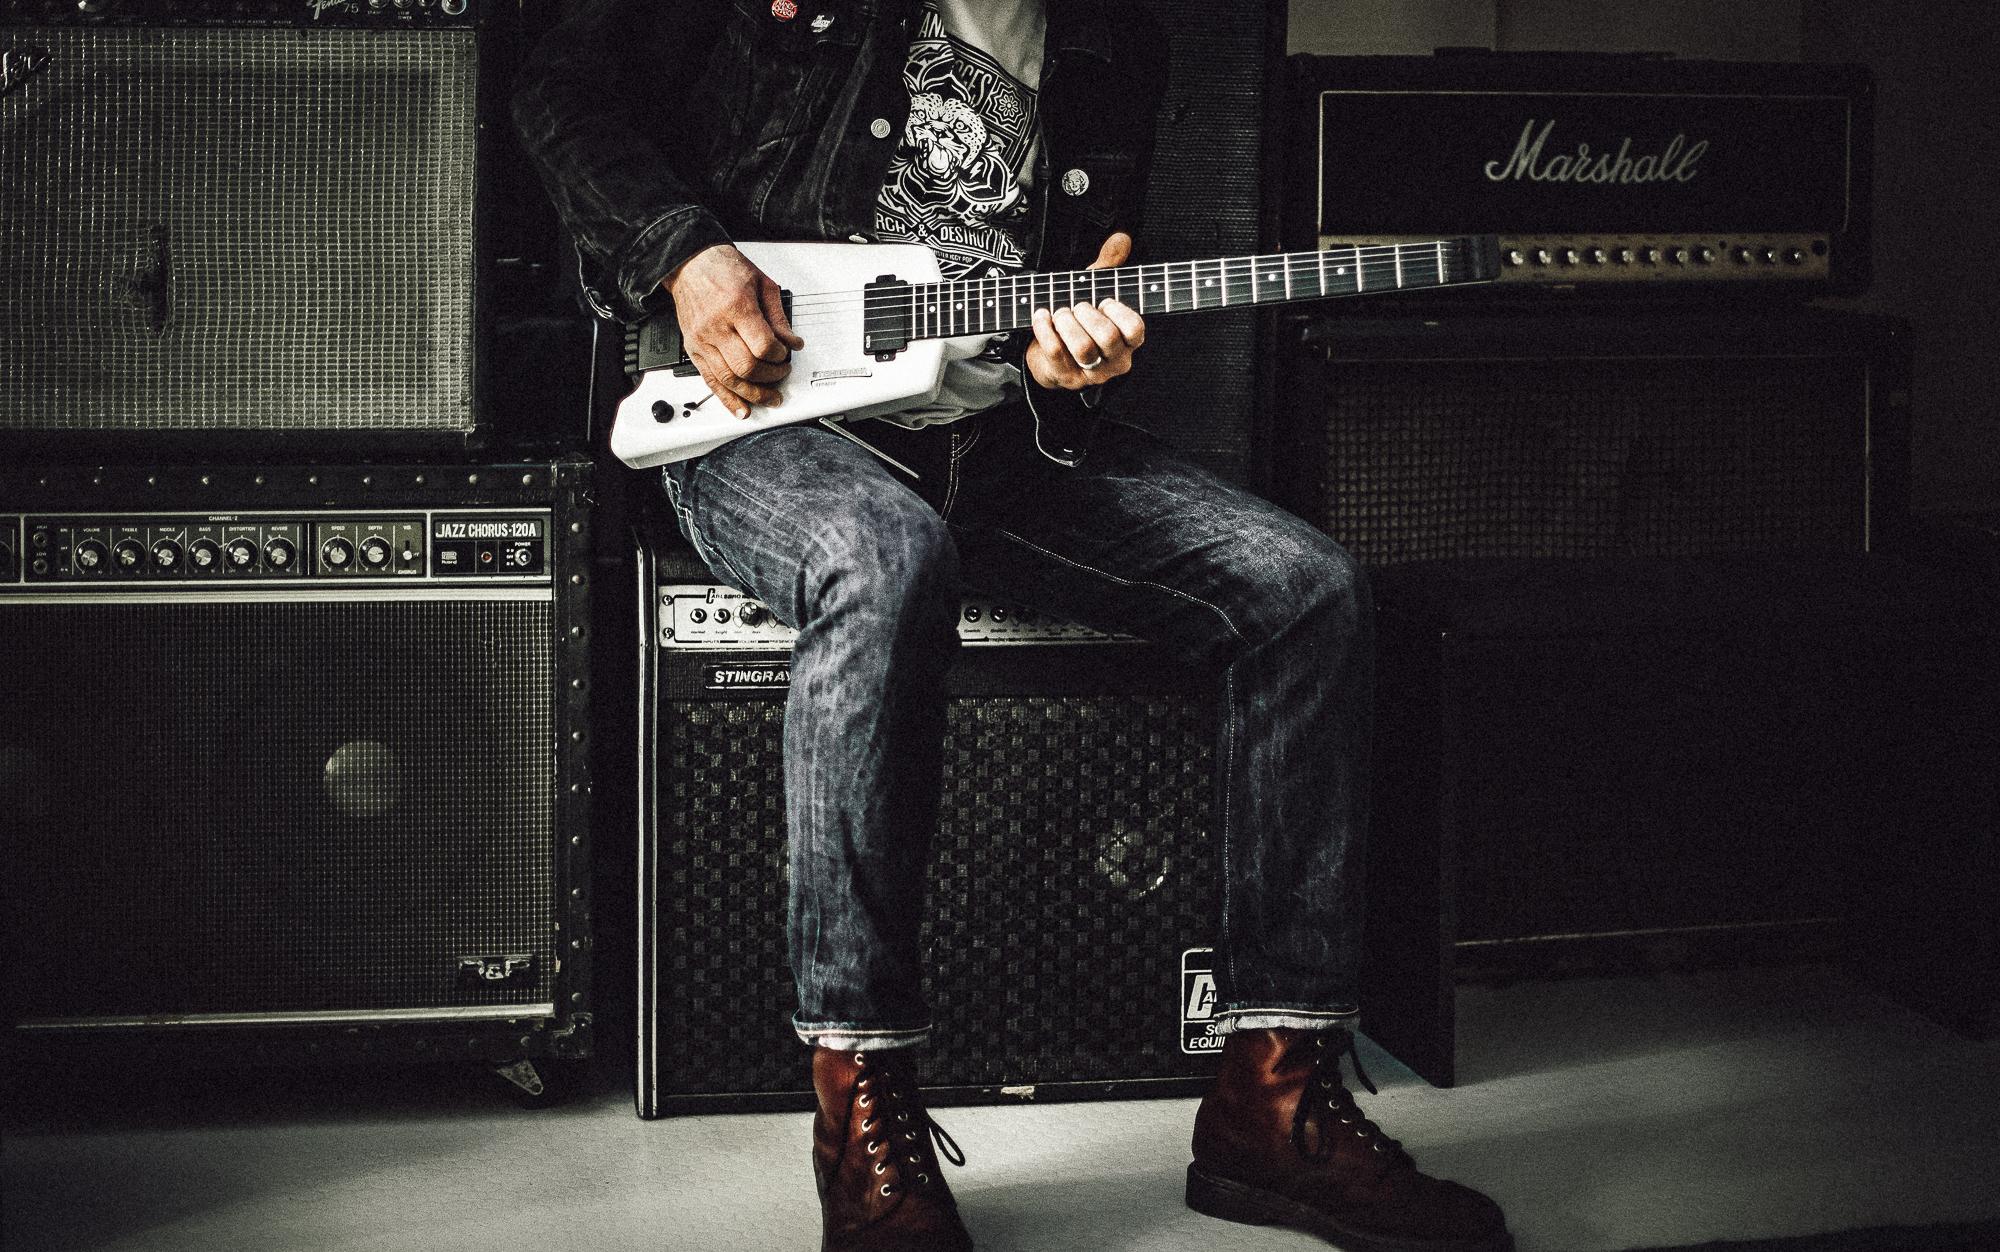 Man Sitting on Guitar Amplifier Playing Electric Guitar